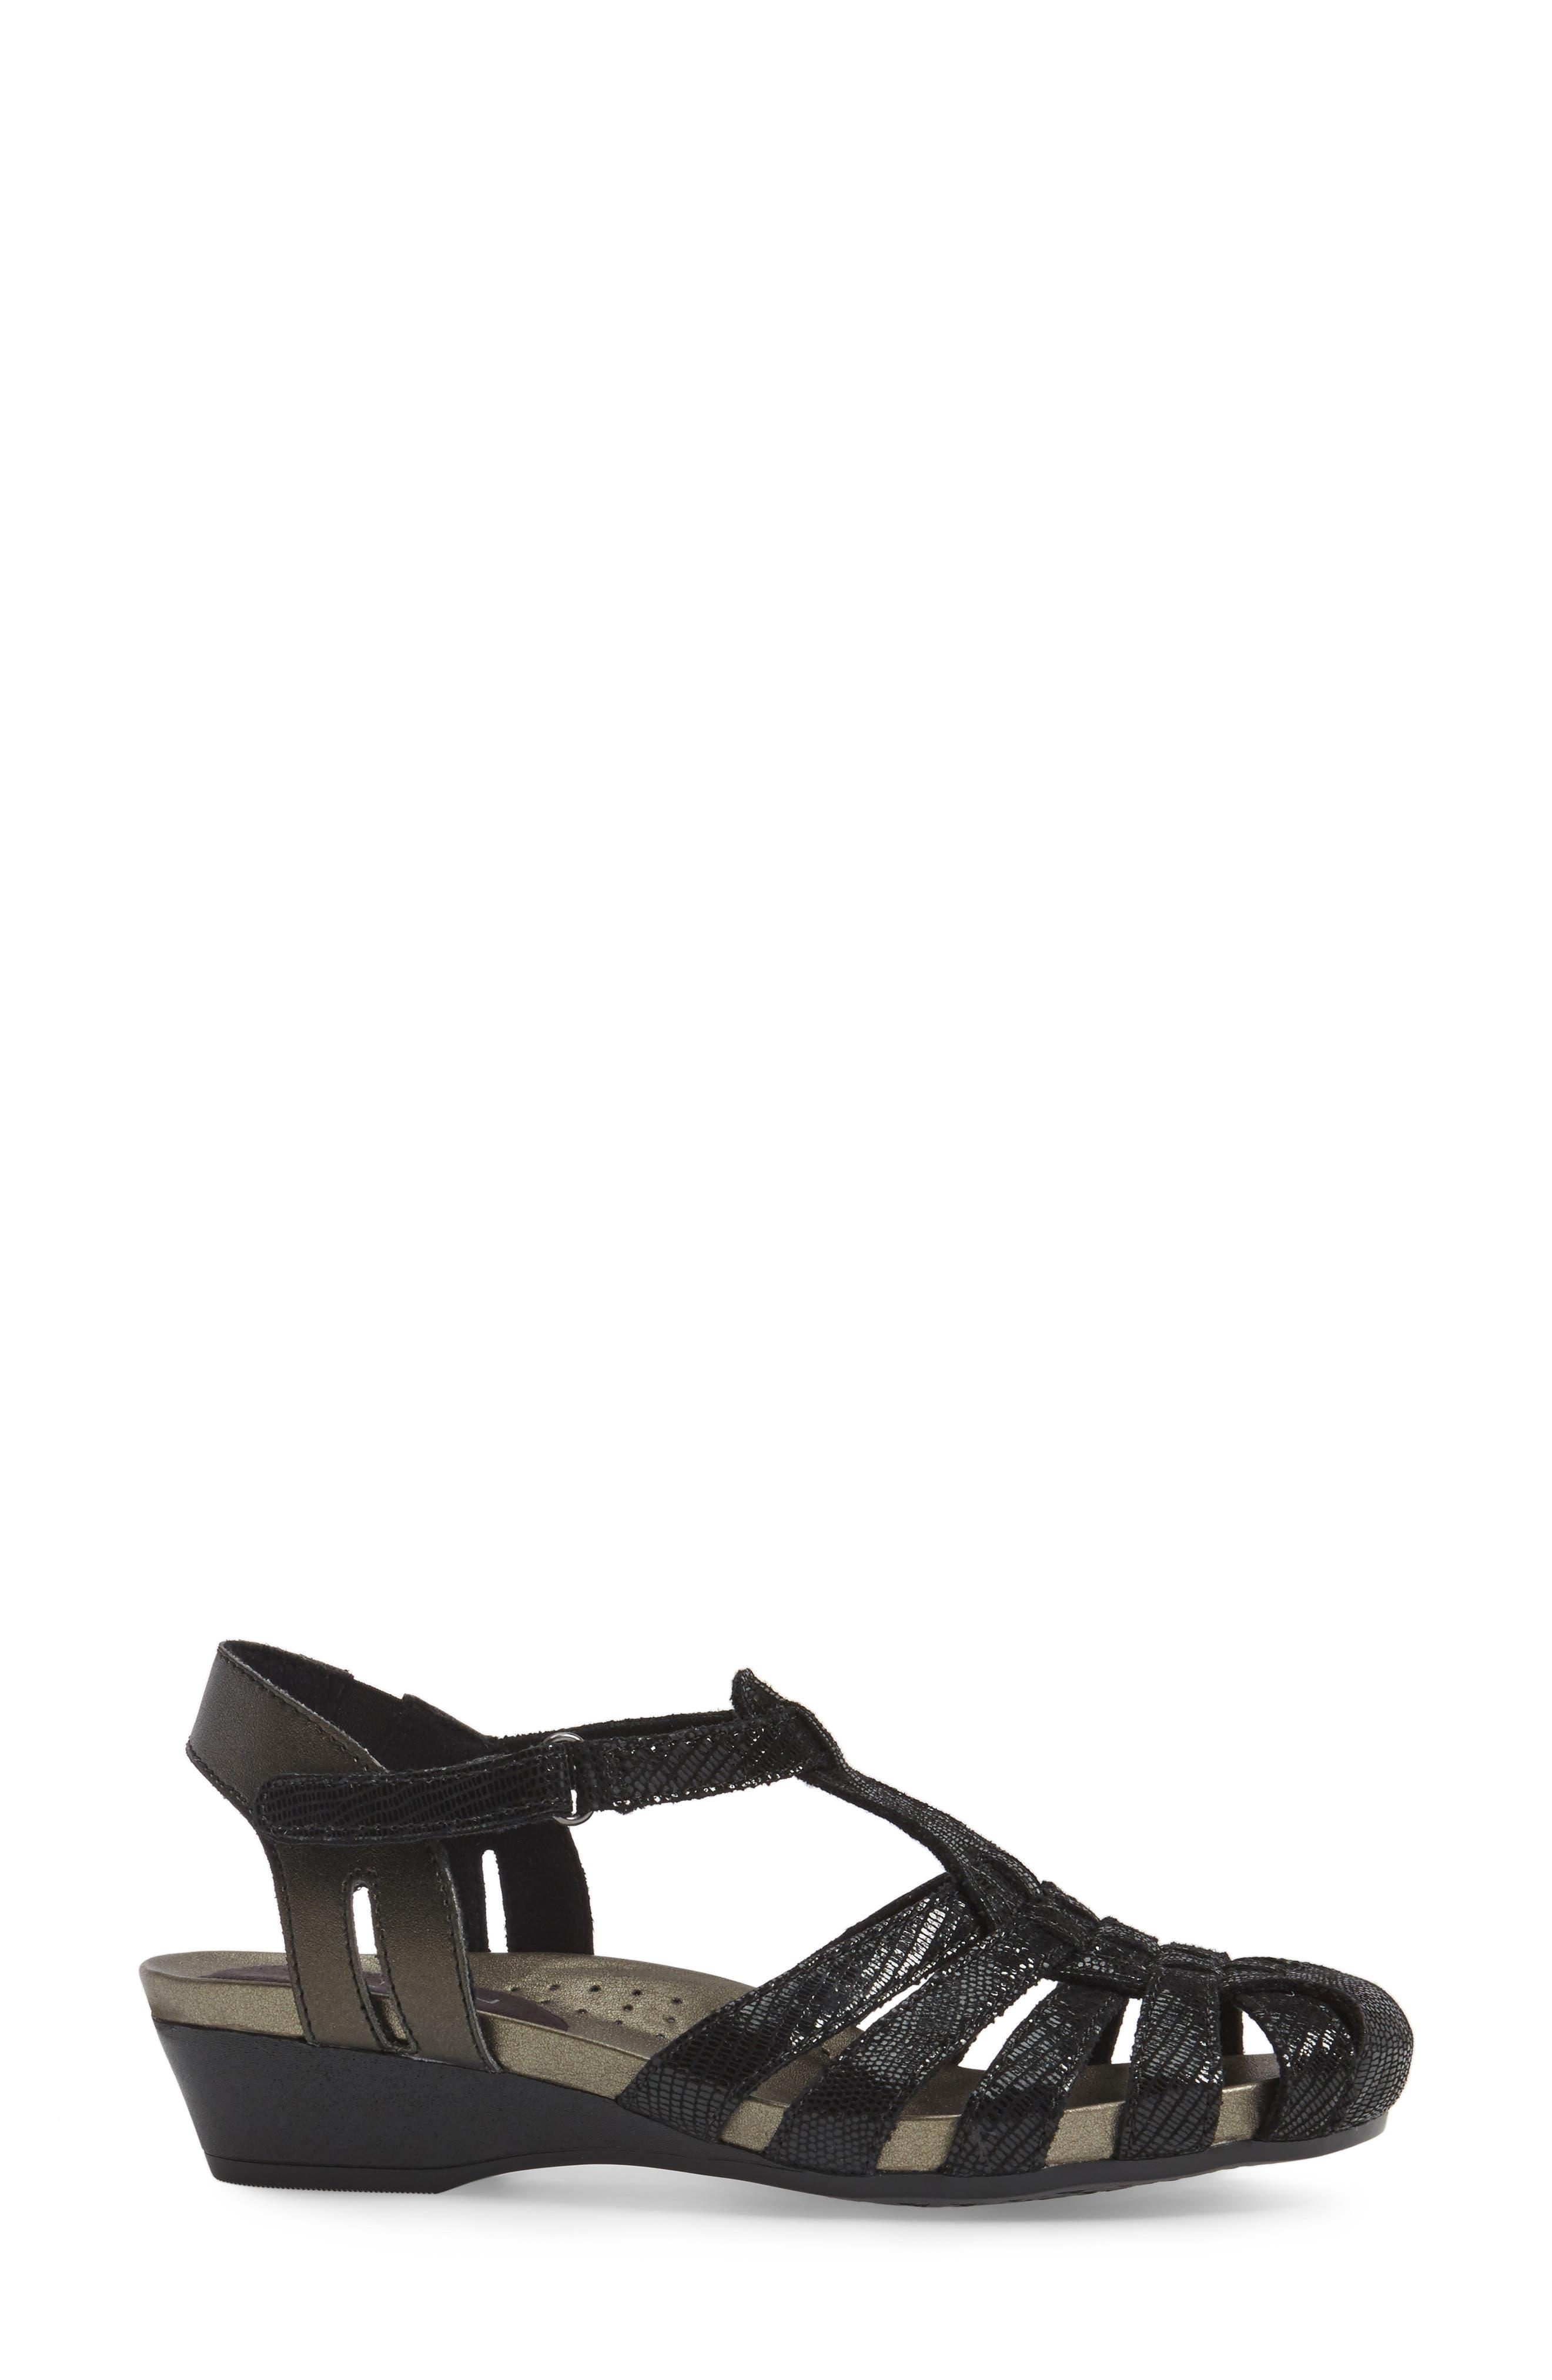 Standon Wedge Sandal,                             Alternate thumbnail 3, color,                             BLACK FABRIC